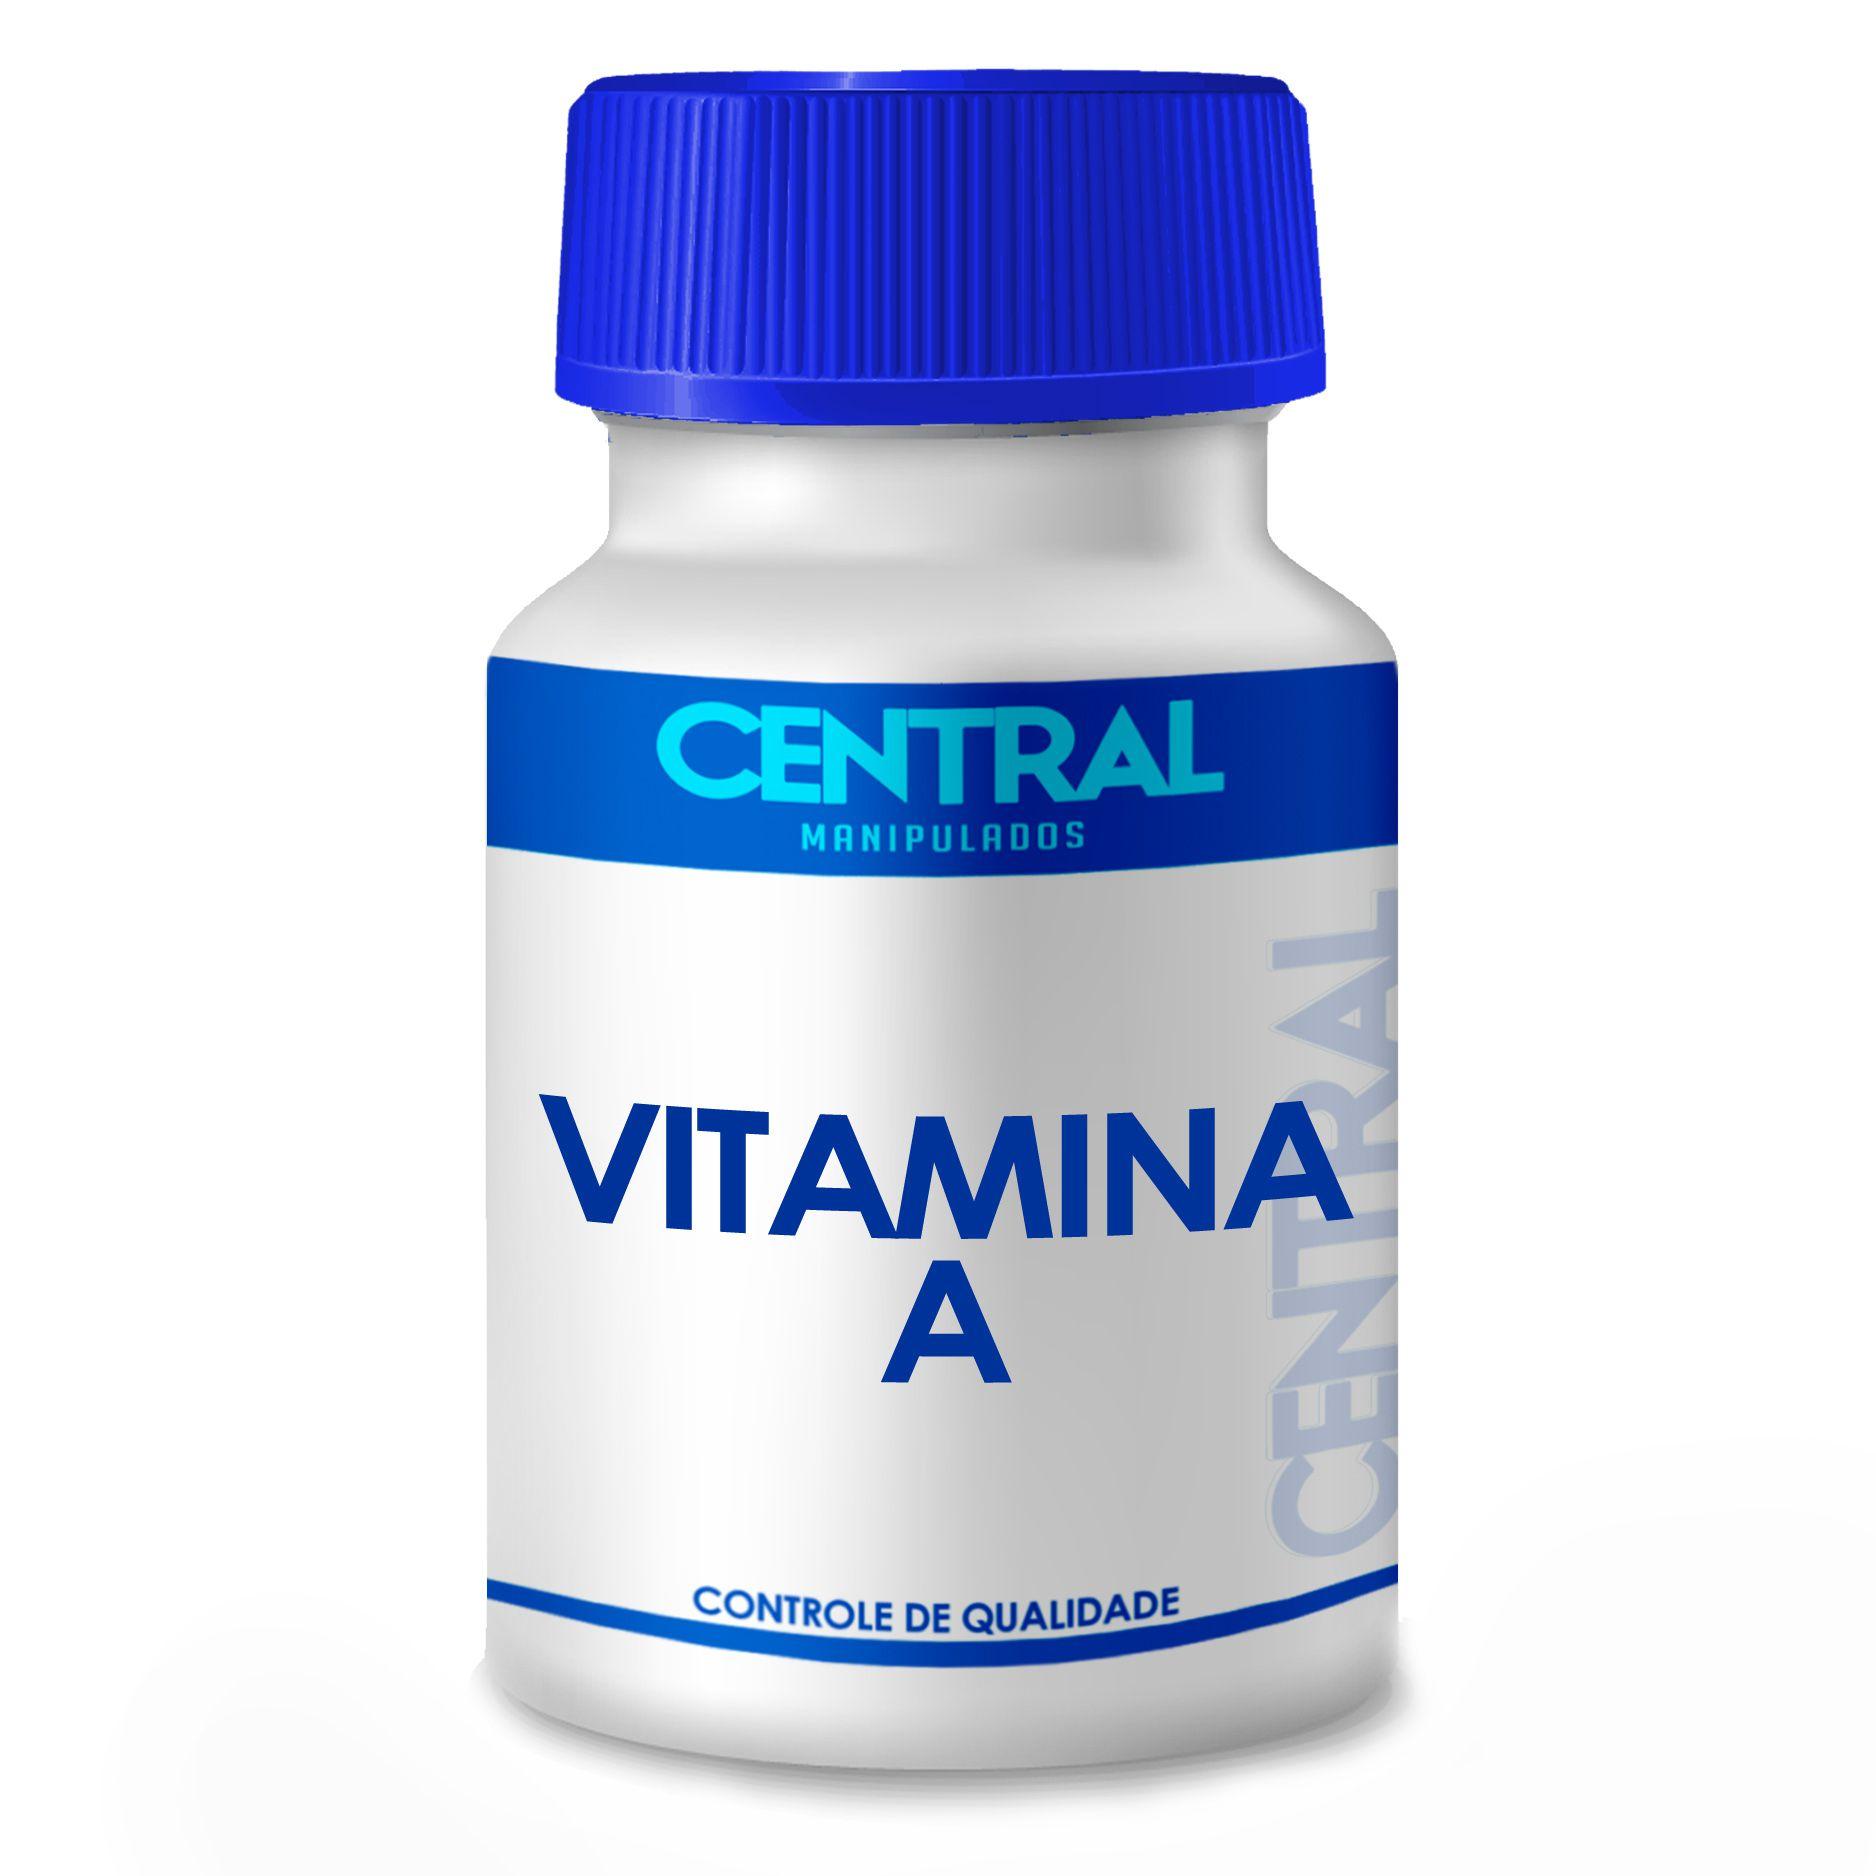 Vitamina A 5.000 UI 90 cápsulas - Boa para Cálculo Renal, Imunidade, Olhos, Ossos, Dentes, Pele e Unhas